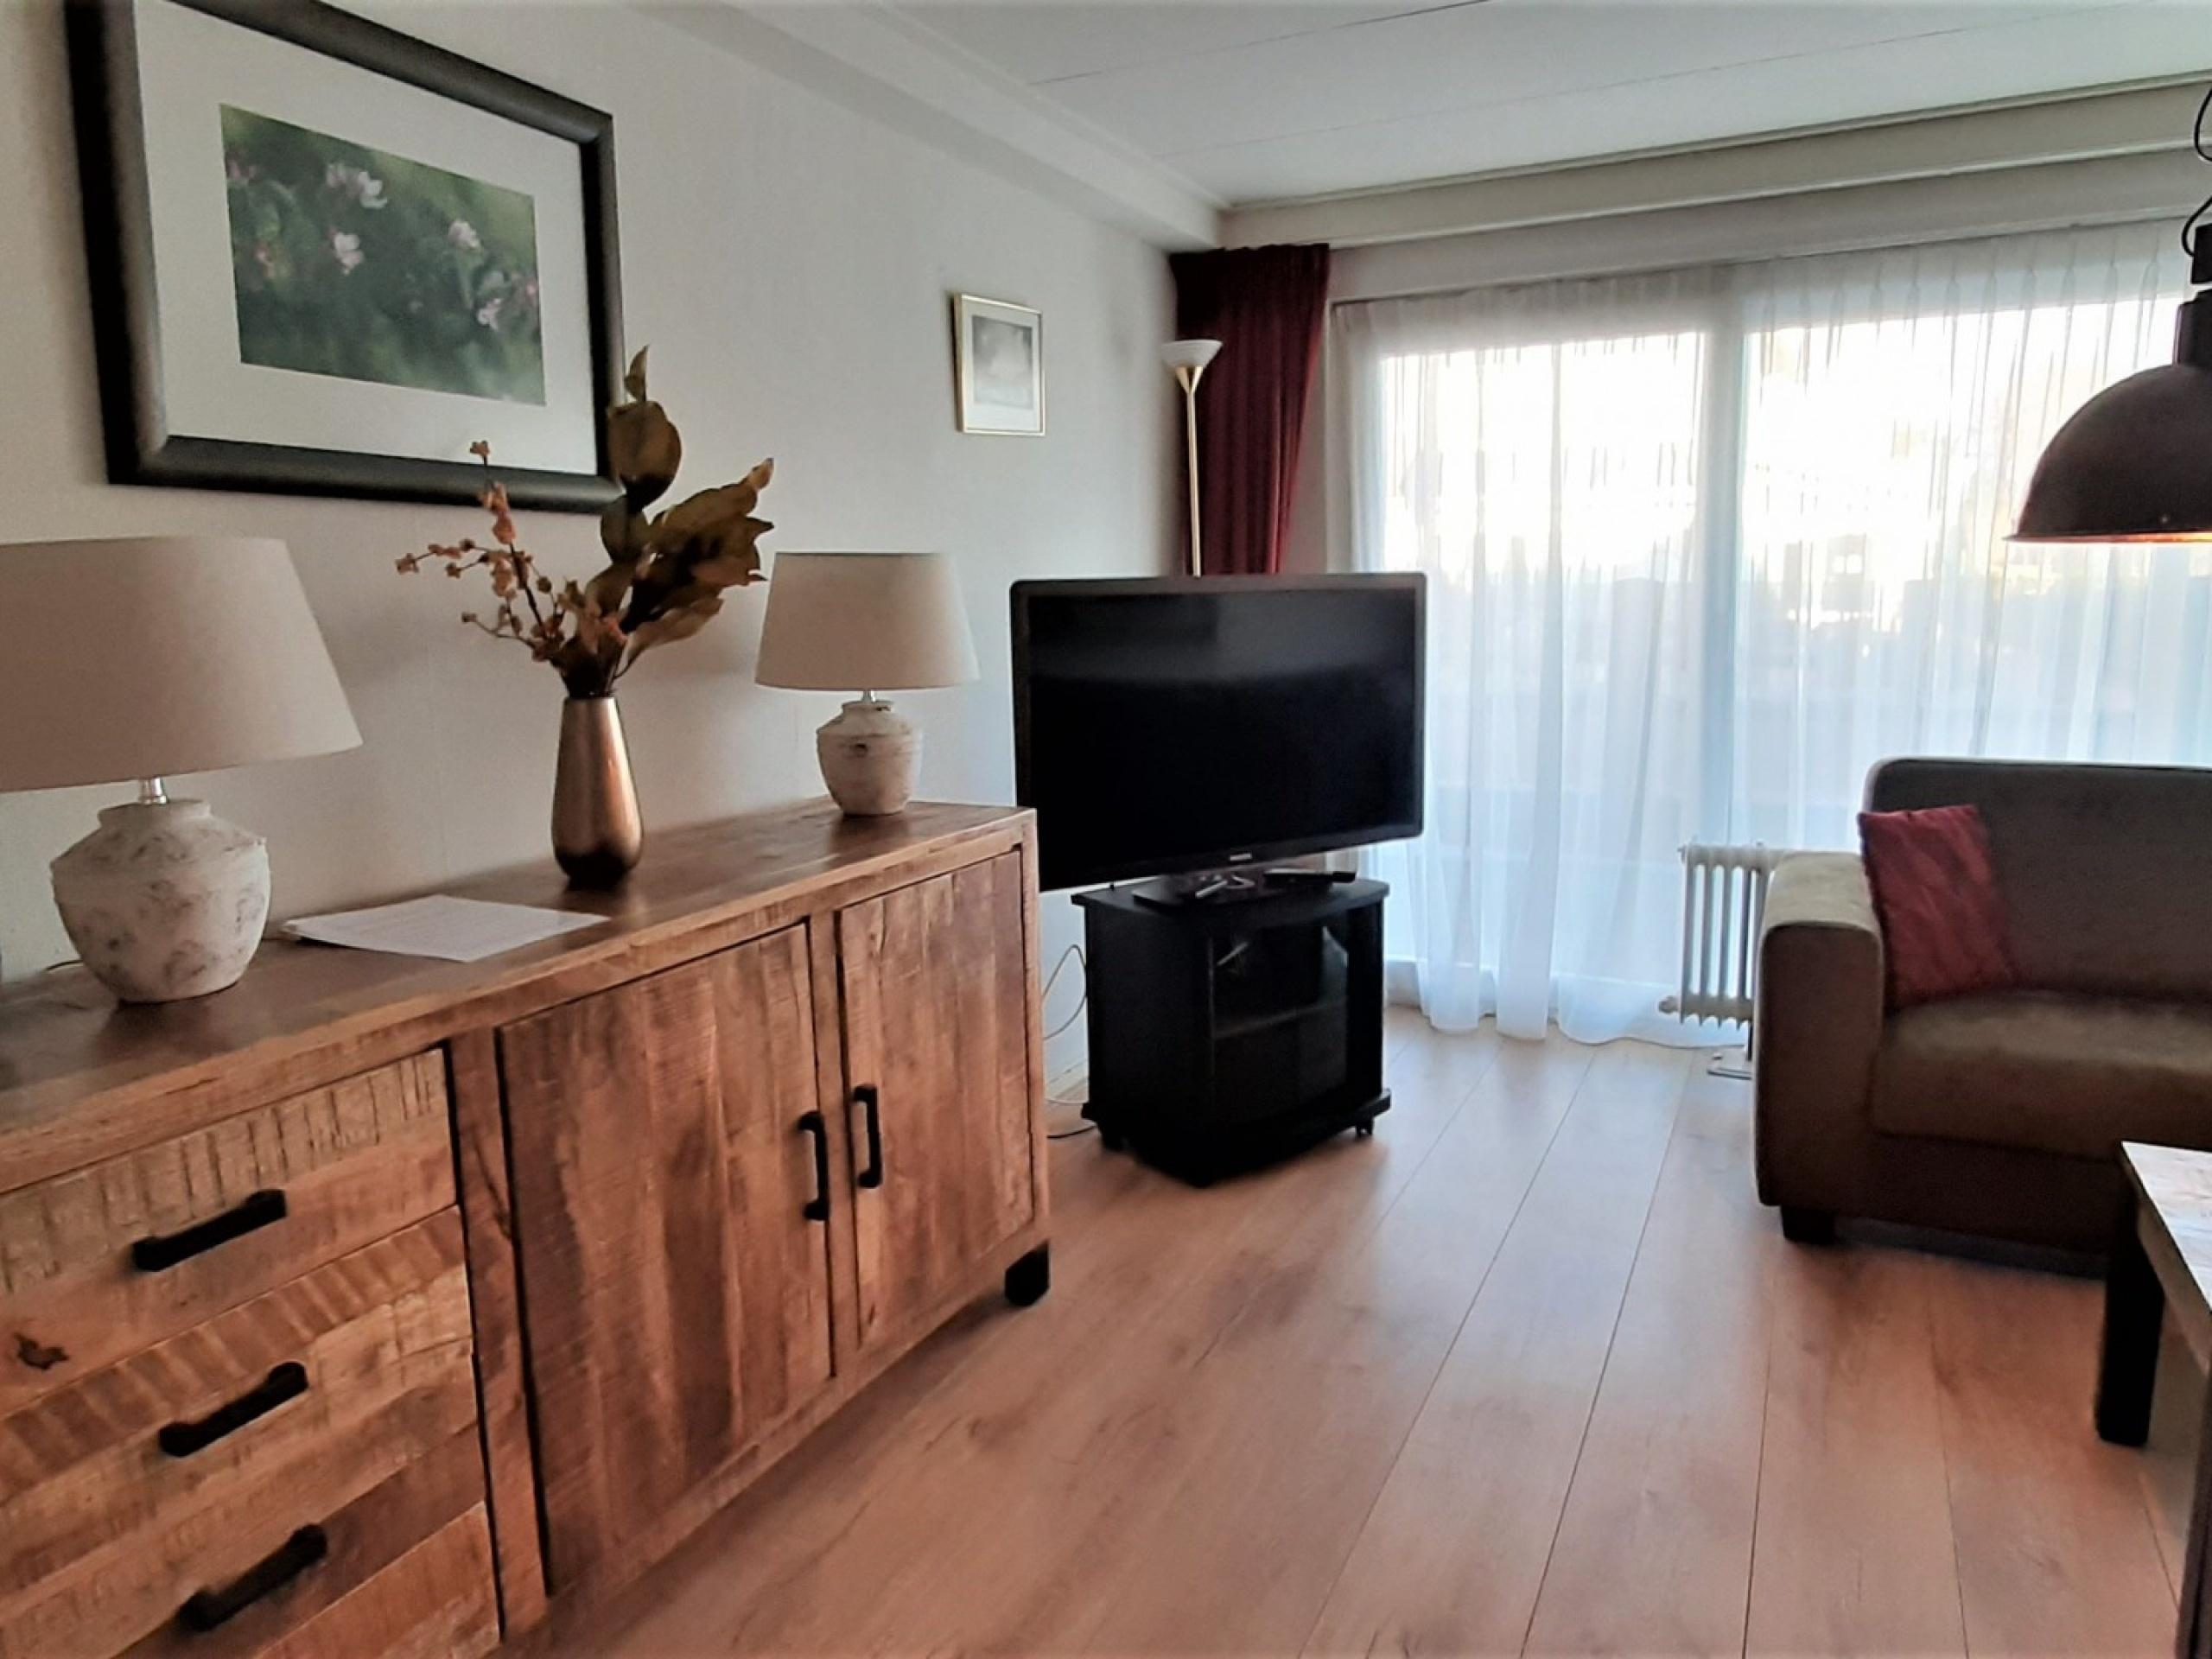 Attractive apartment near the beach in De Koog